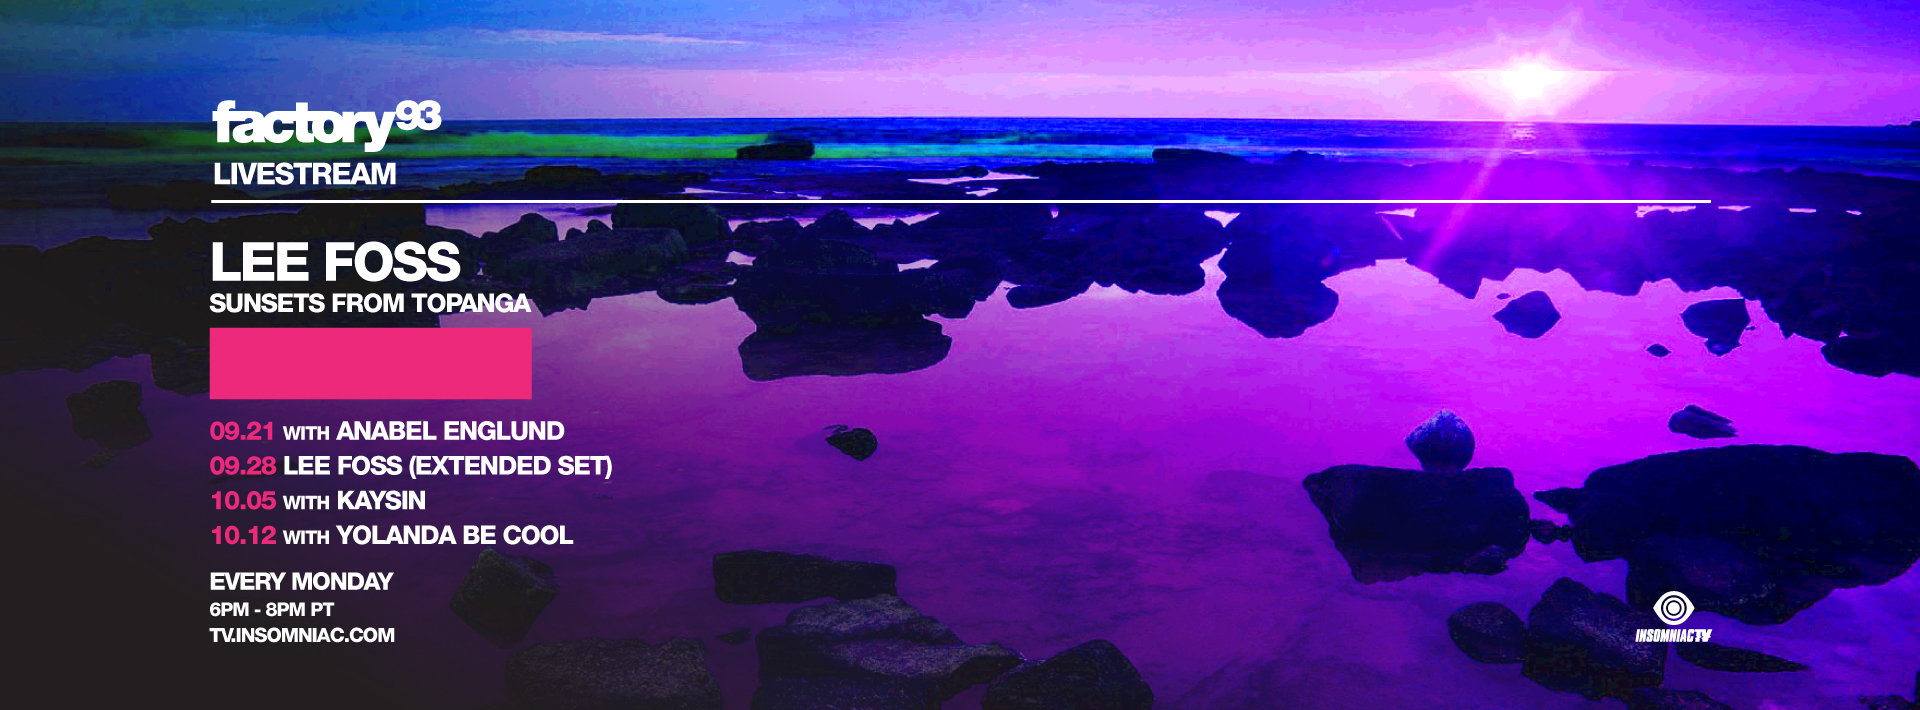 Lee Foss: Sunsets From Topanga